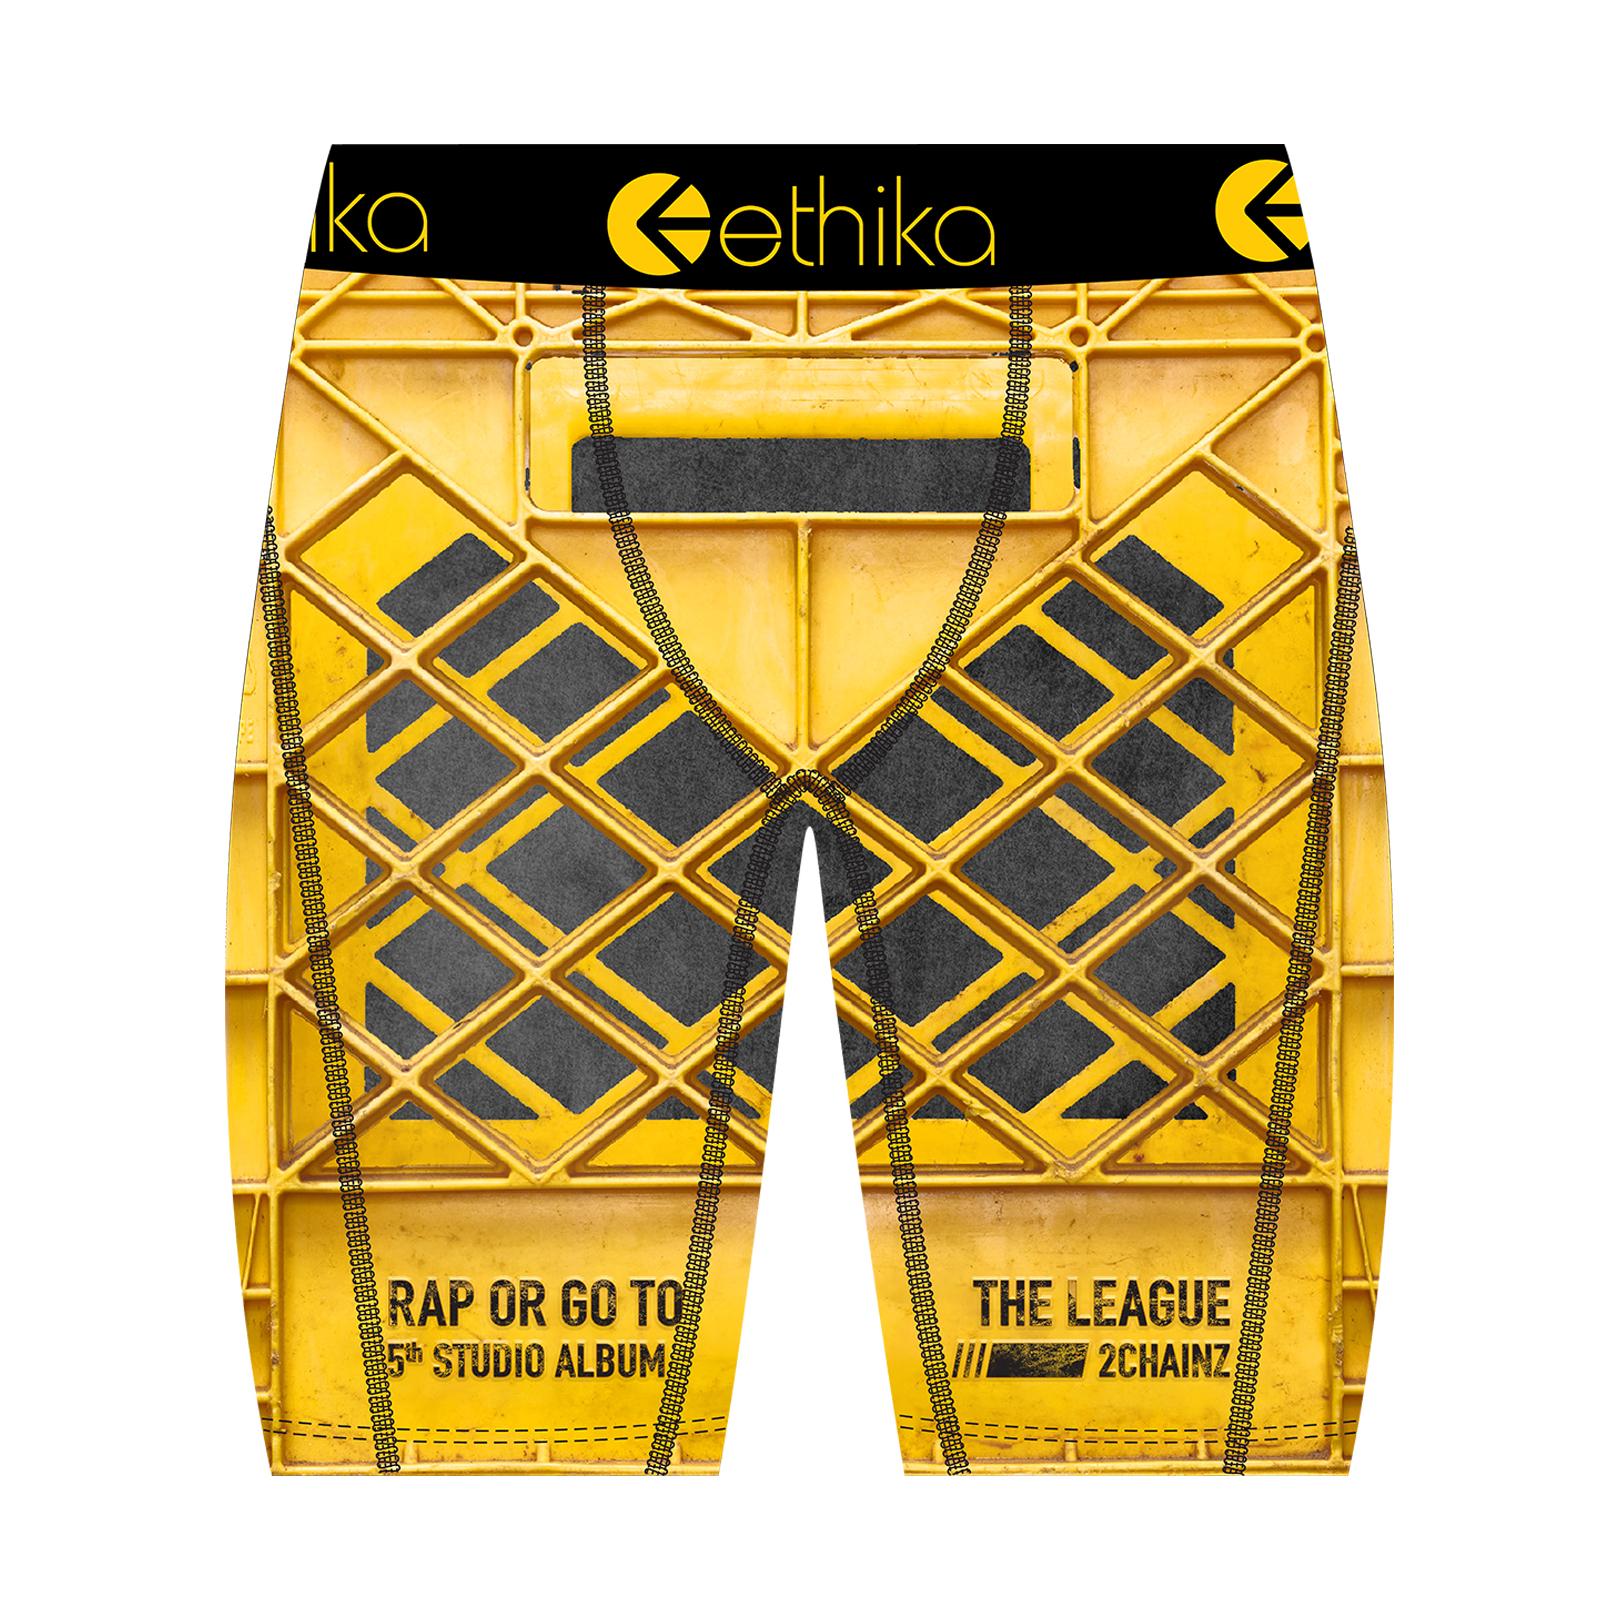 ROGTTL Crate Ethika Underwear